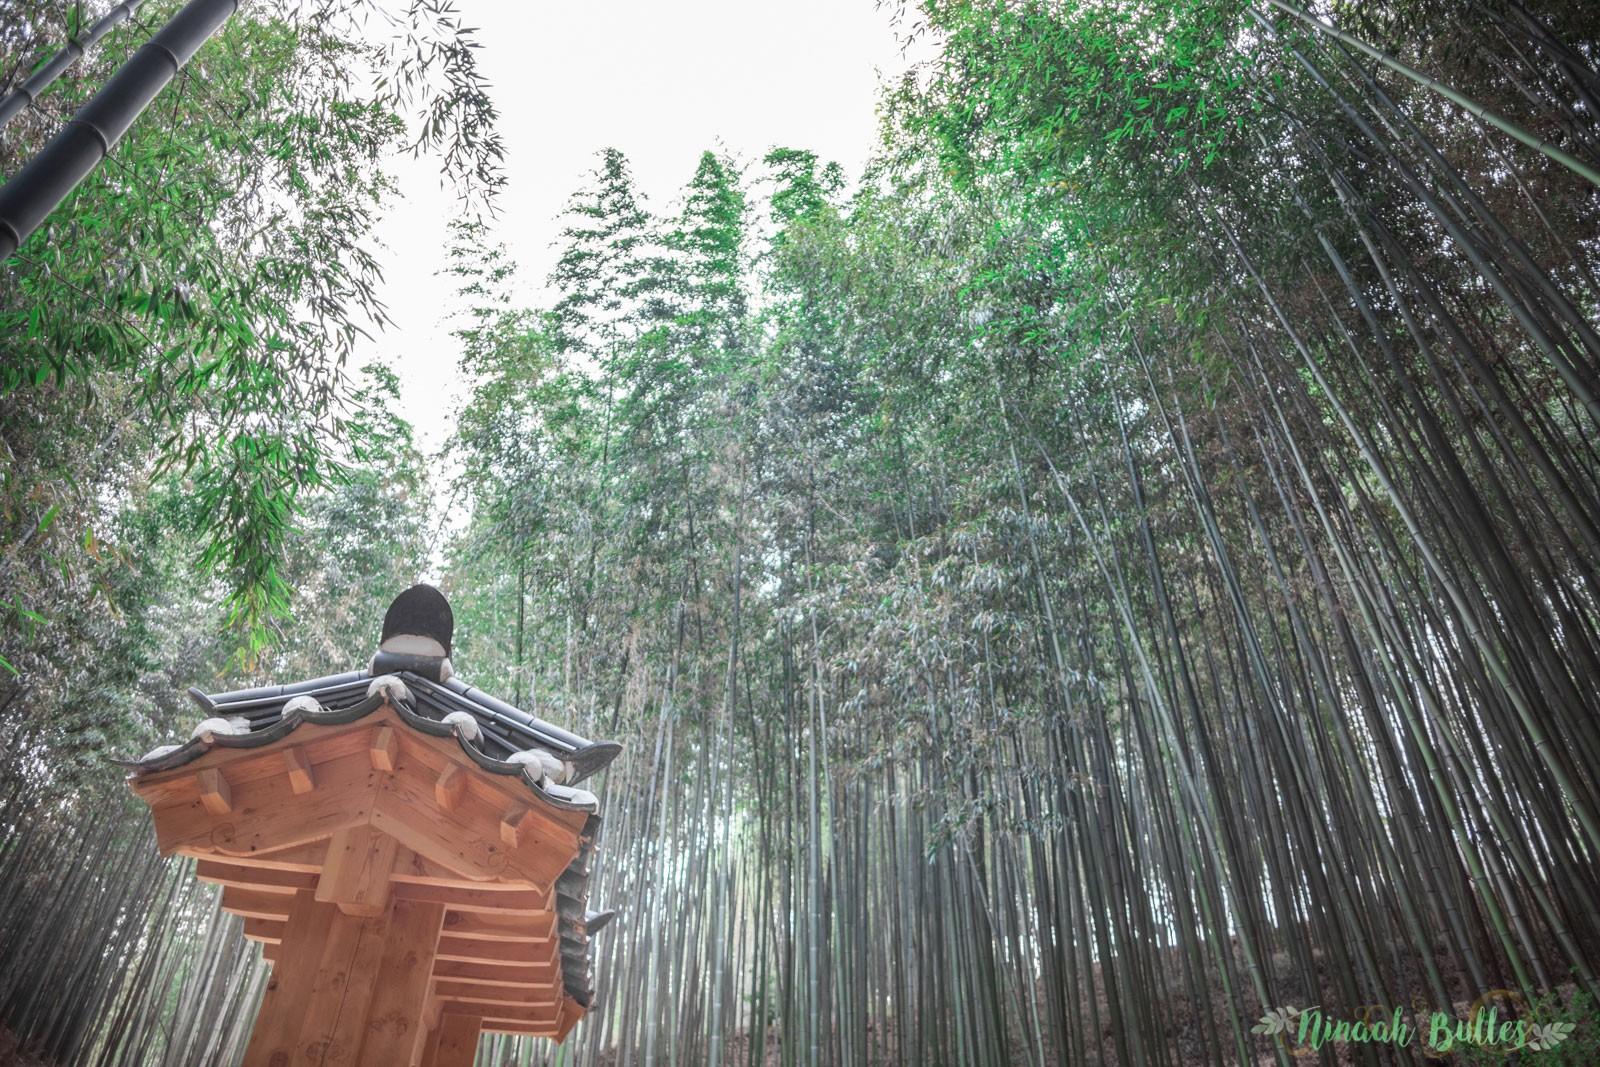 Ninah Gerude, Ninaah Bulles, Damyang, korea, corée du sud, bambou, voyage, Juknokwon